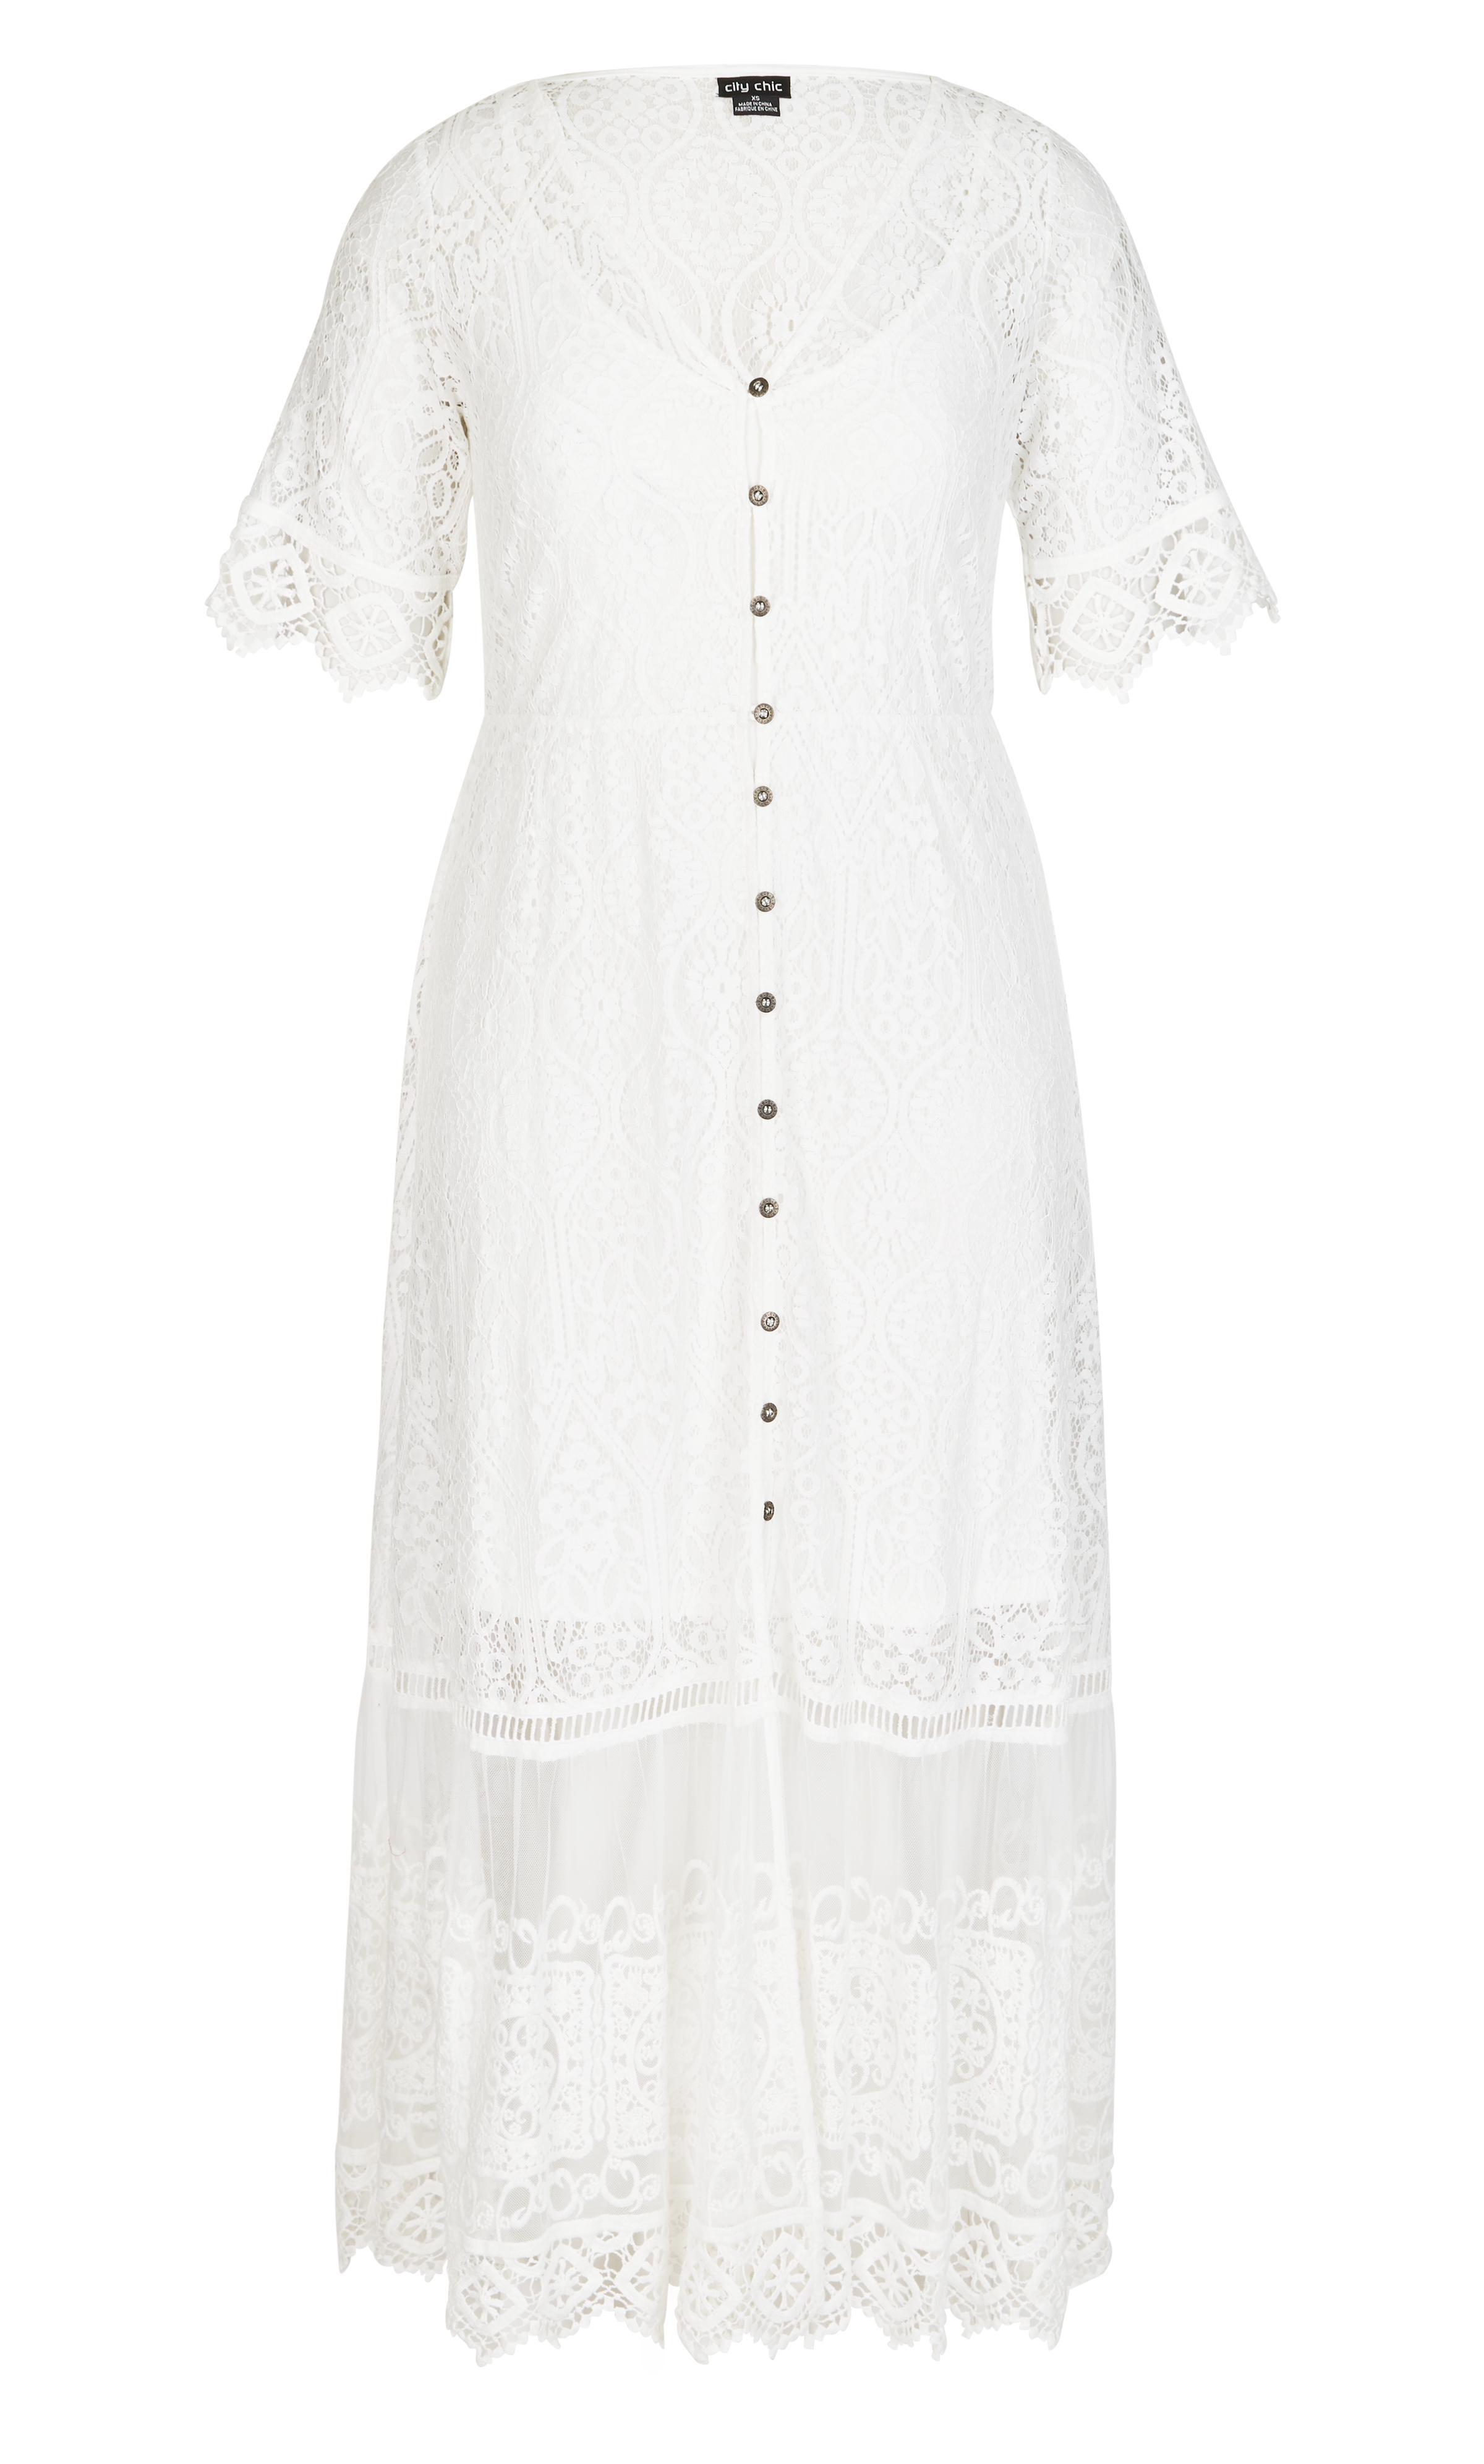 1f2a5cc7abc7a ... Ivory Summer Lace Maxi Dress - Lyst. View fullscreen